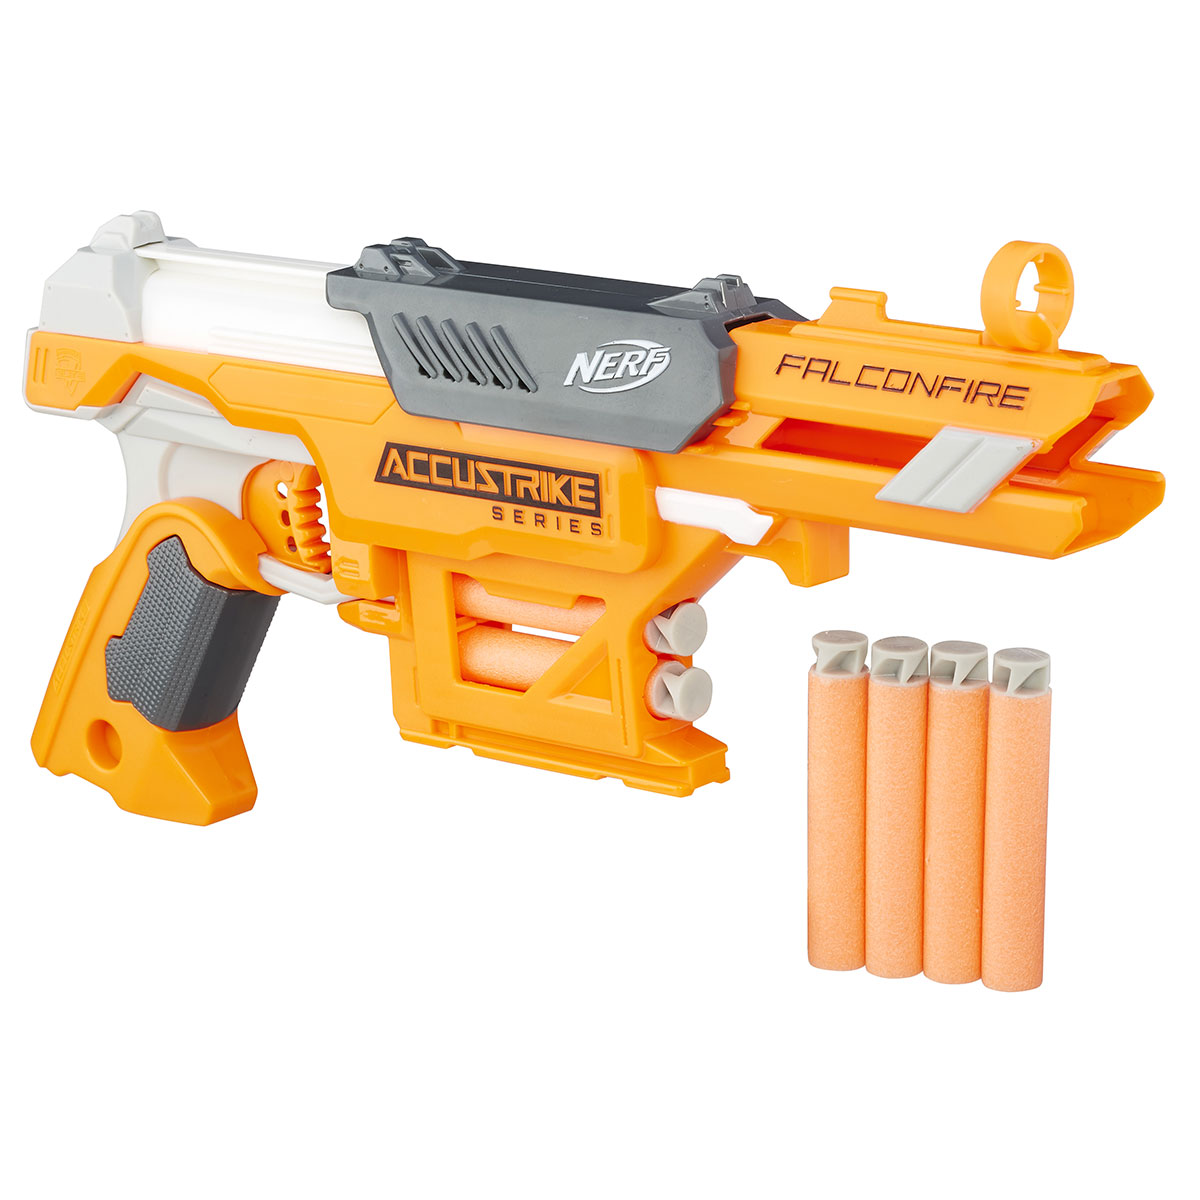 Nerf blaster - Nstrike Elite Accustrike FalconFire